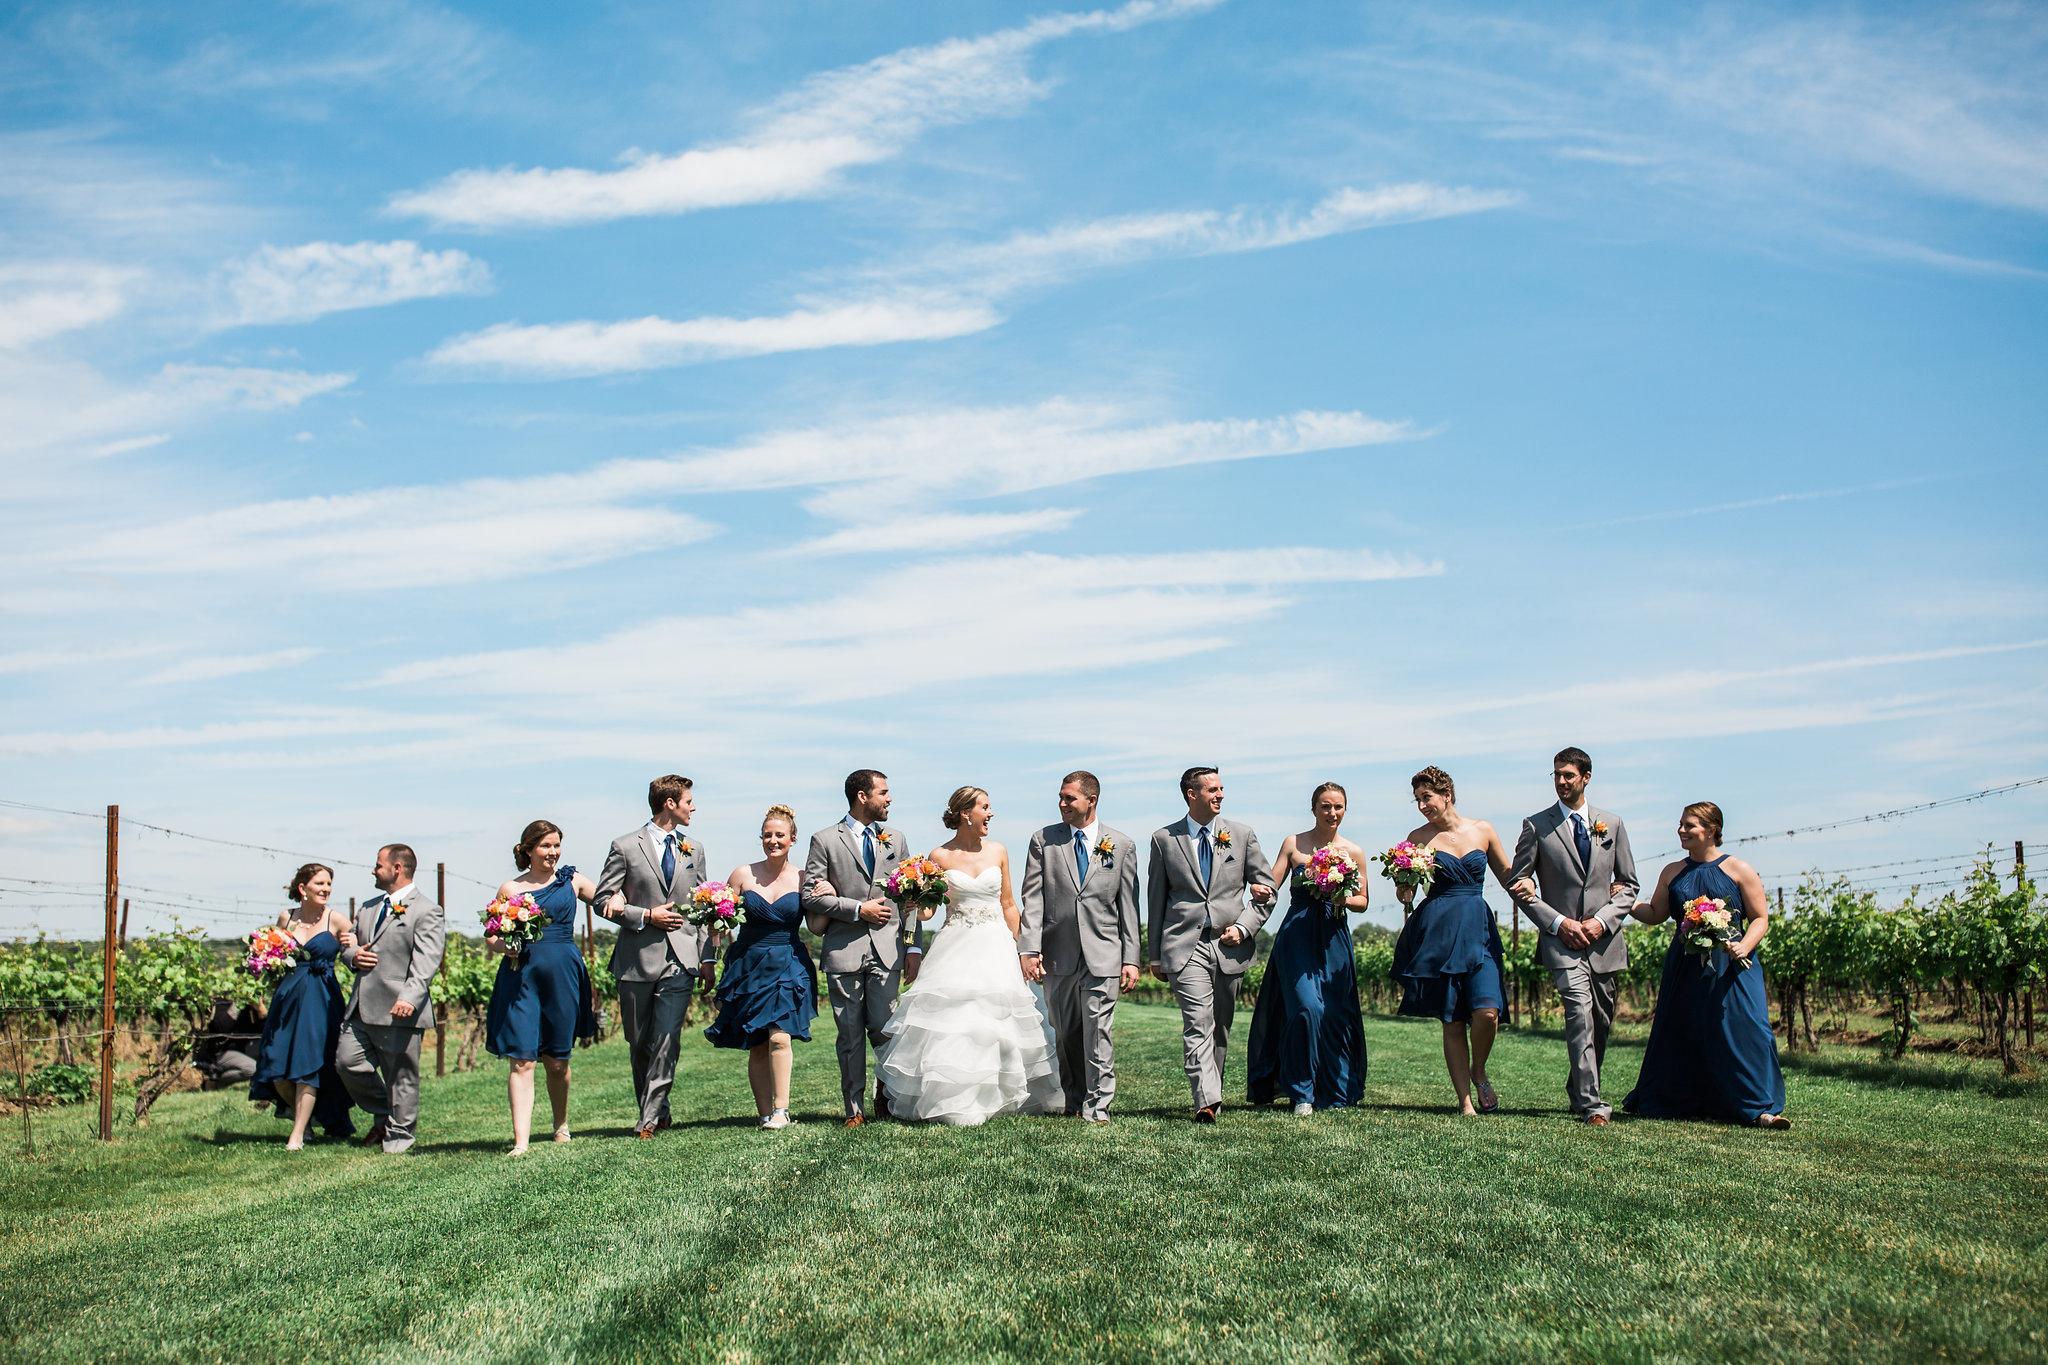 connecticut wedding 4.jpg